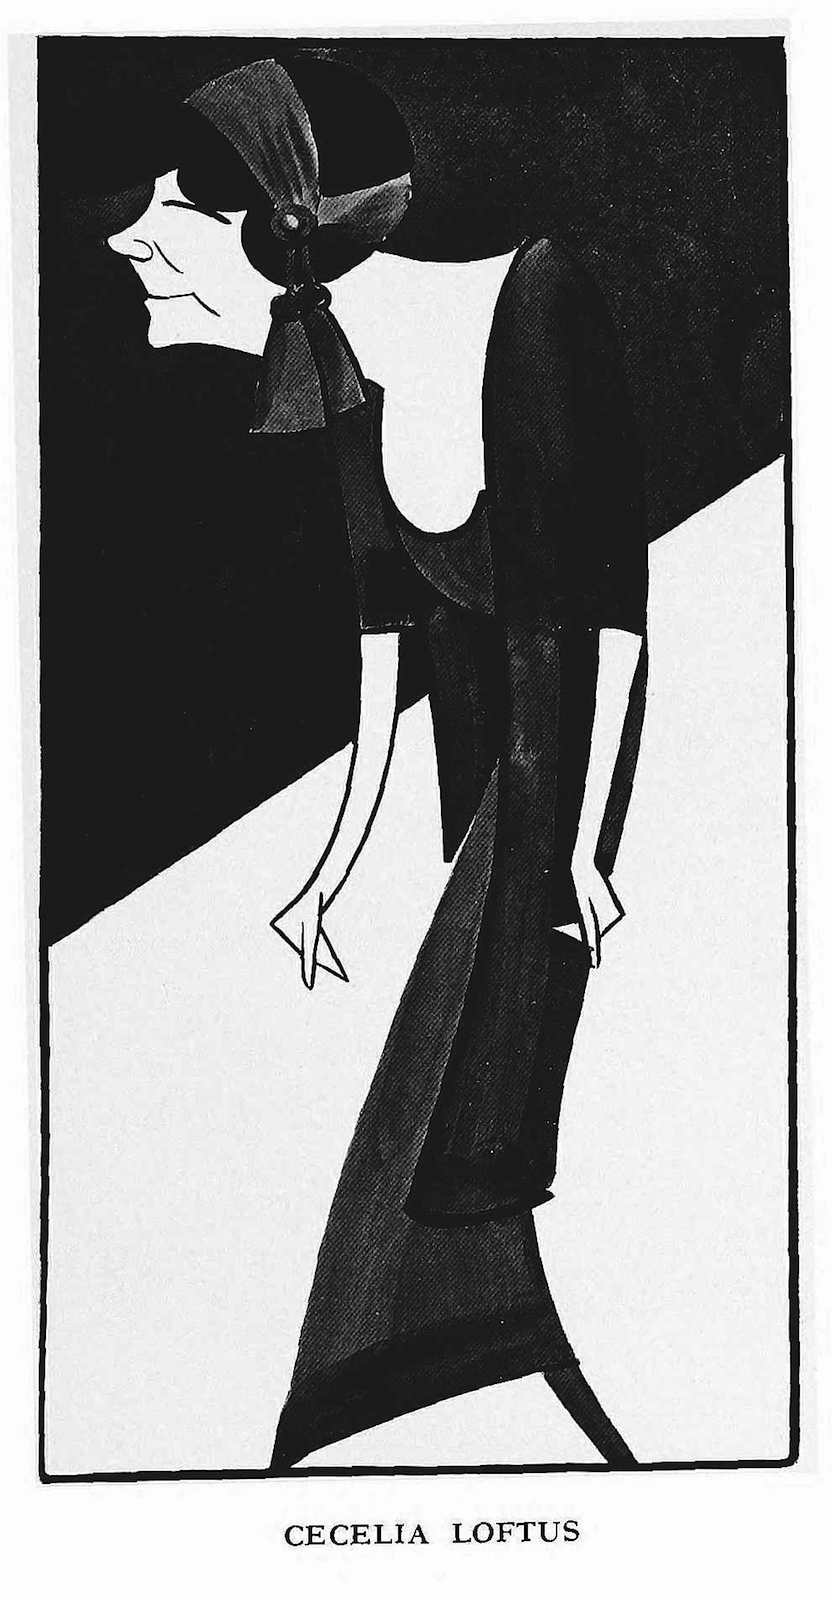 Vaudeville performer Cecelia Loftus, 1915